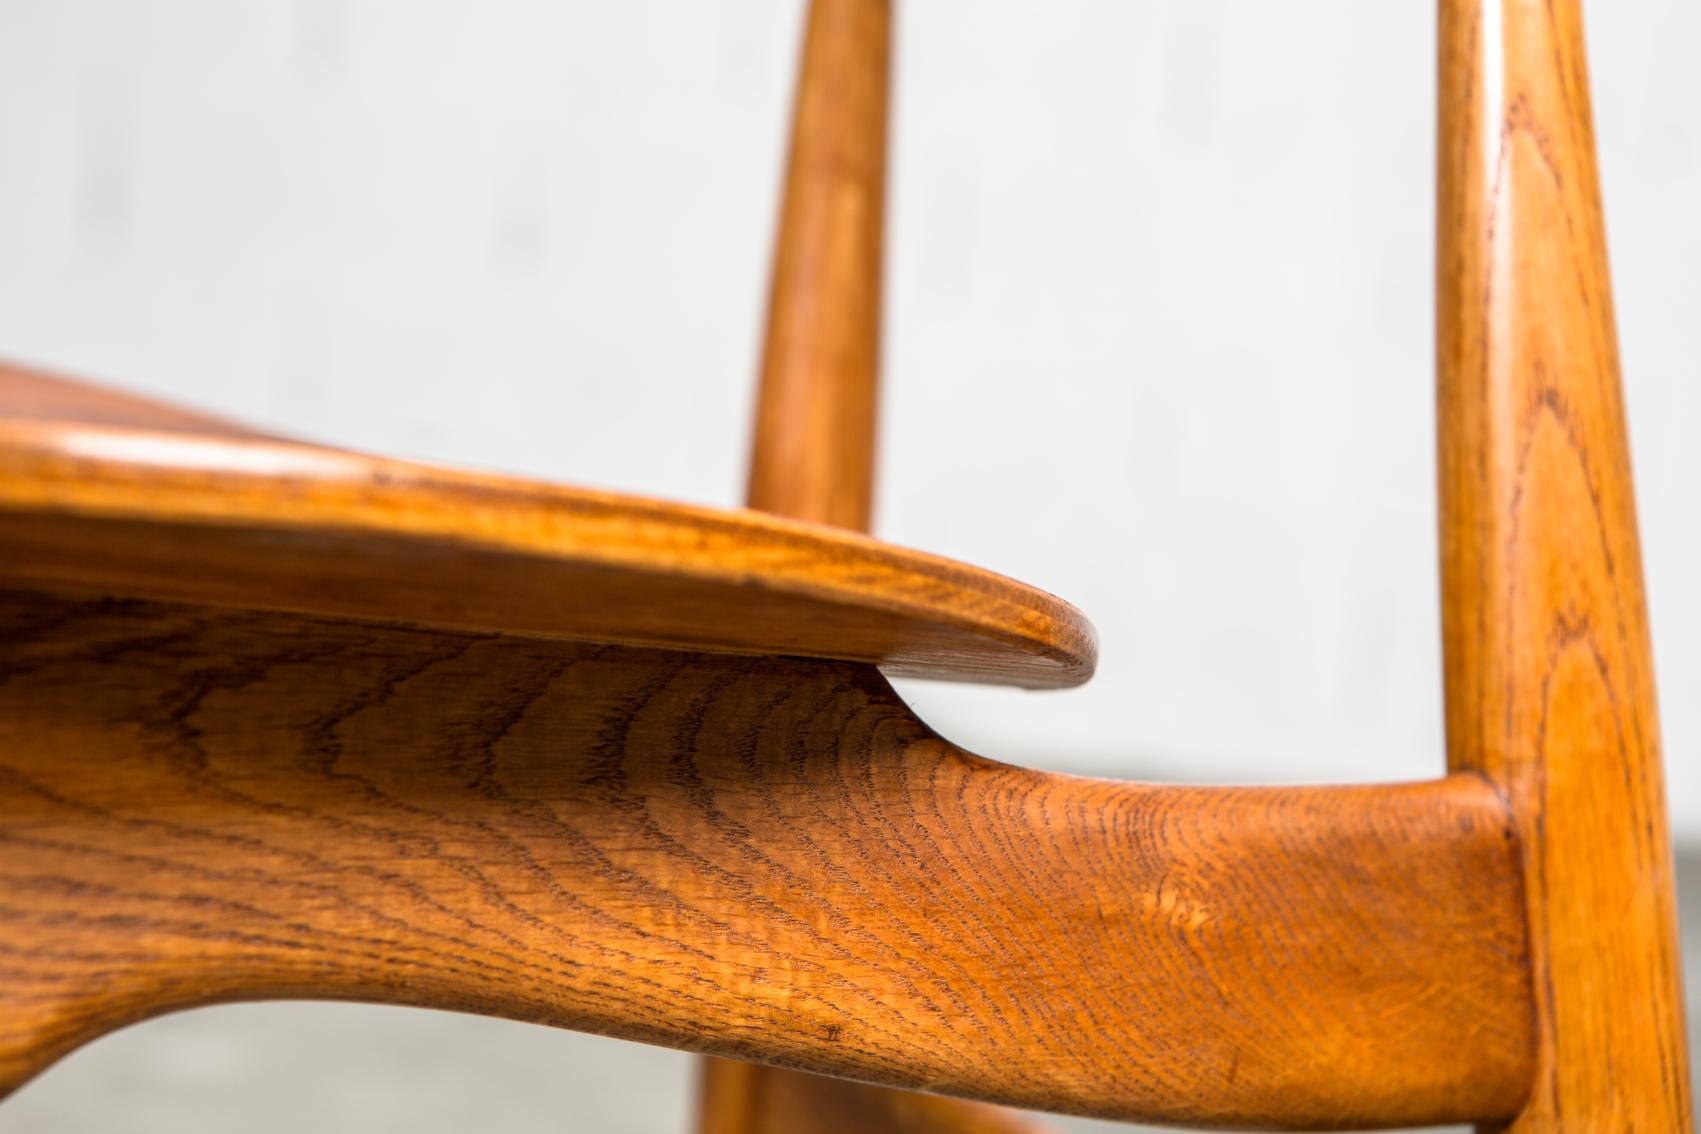 Molded teak backrests and oak frames CH 33 chairs - Hans J. Wegner for Carl Hansen & Son - Oak detail